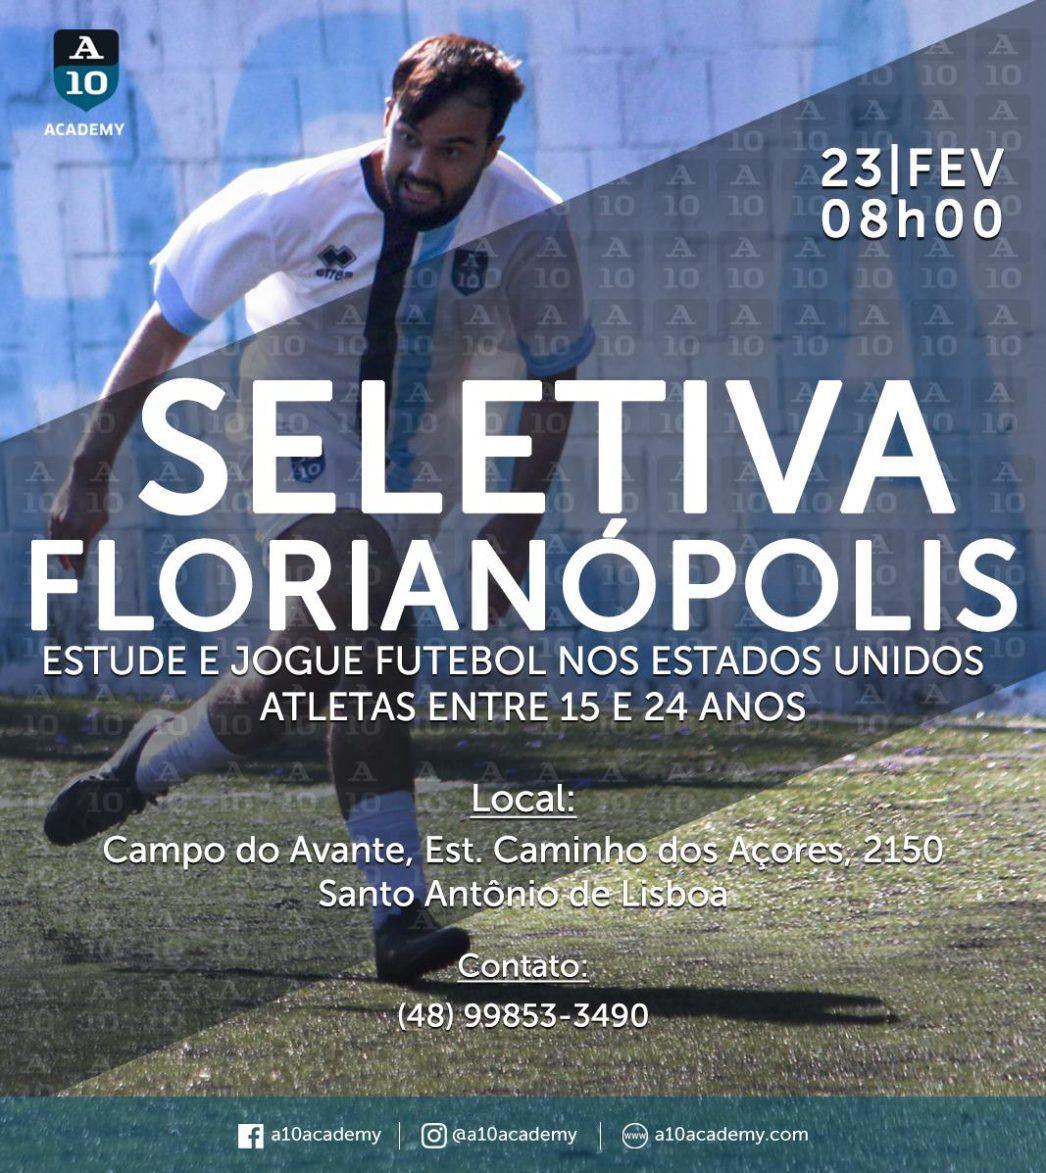 seletiva florianopolis